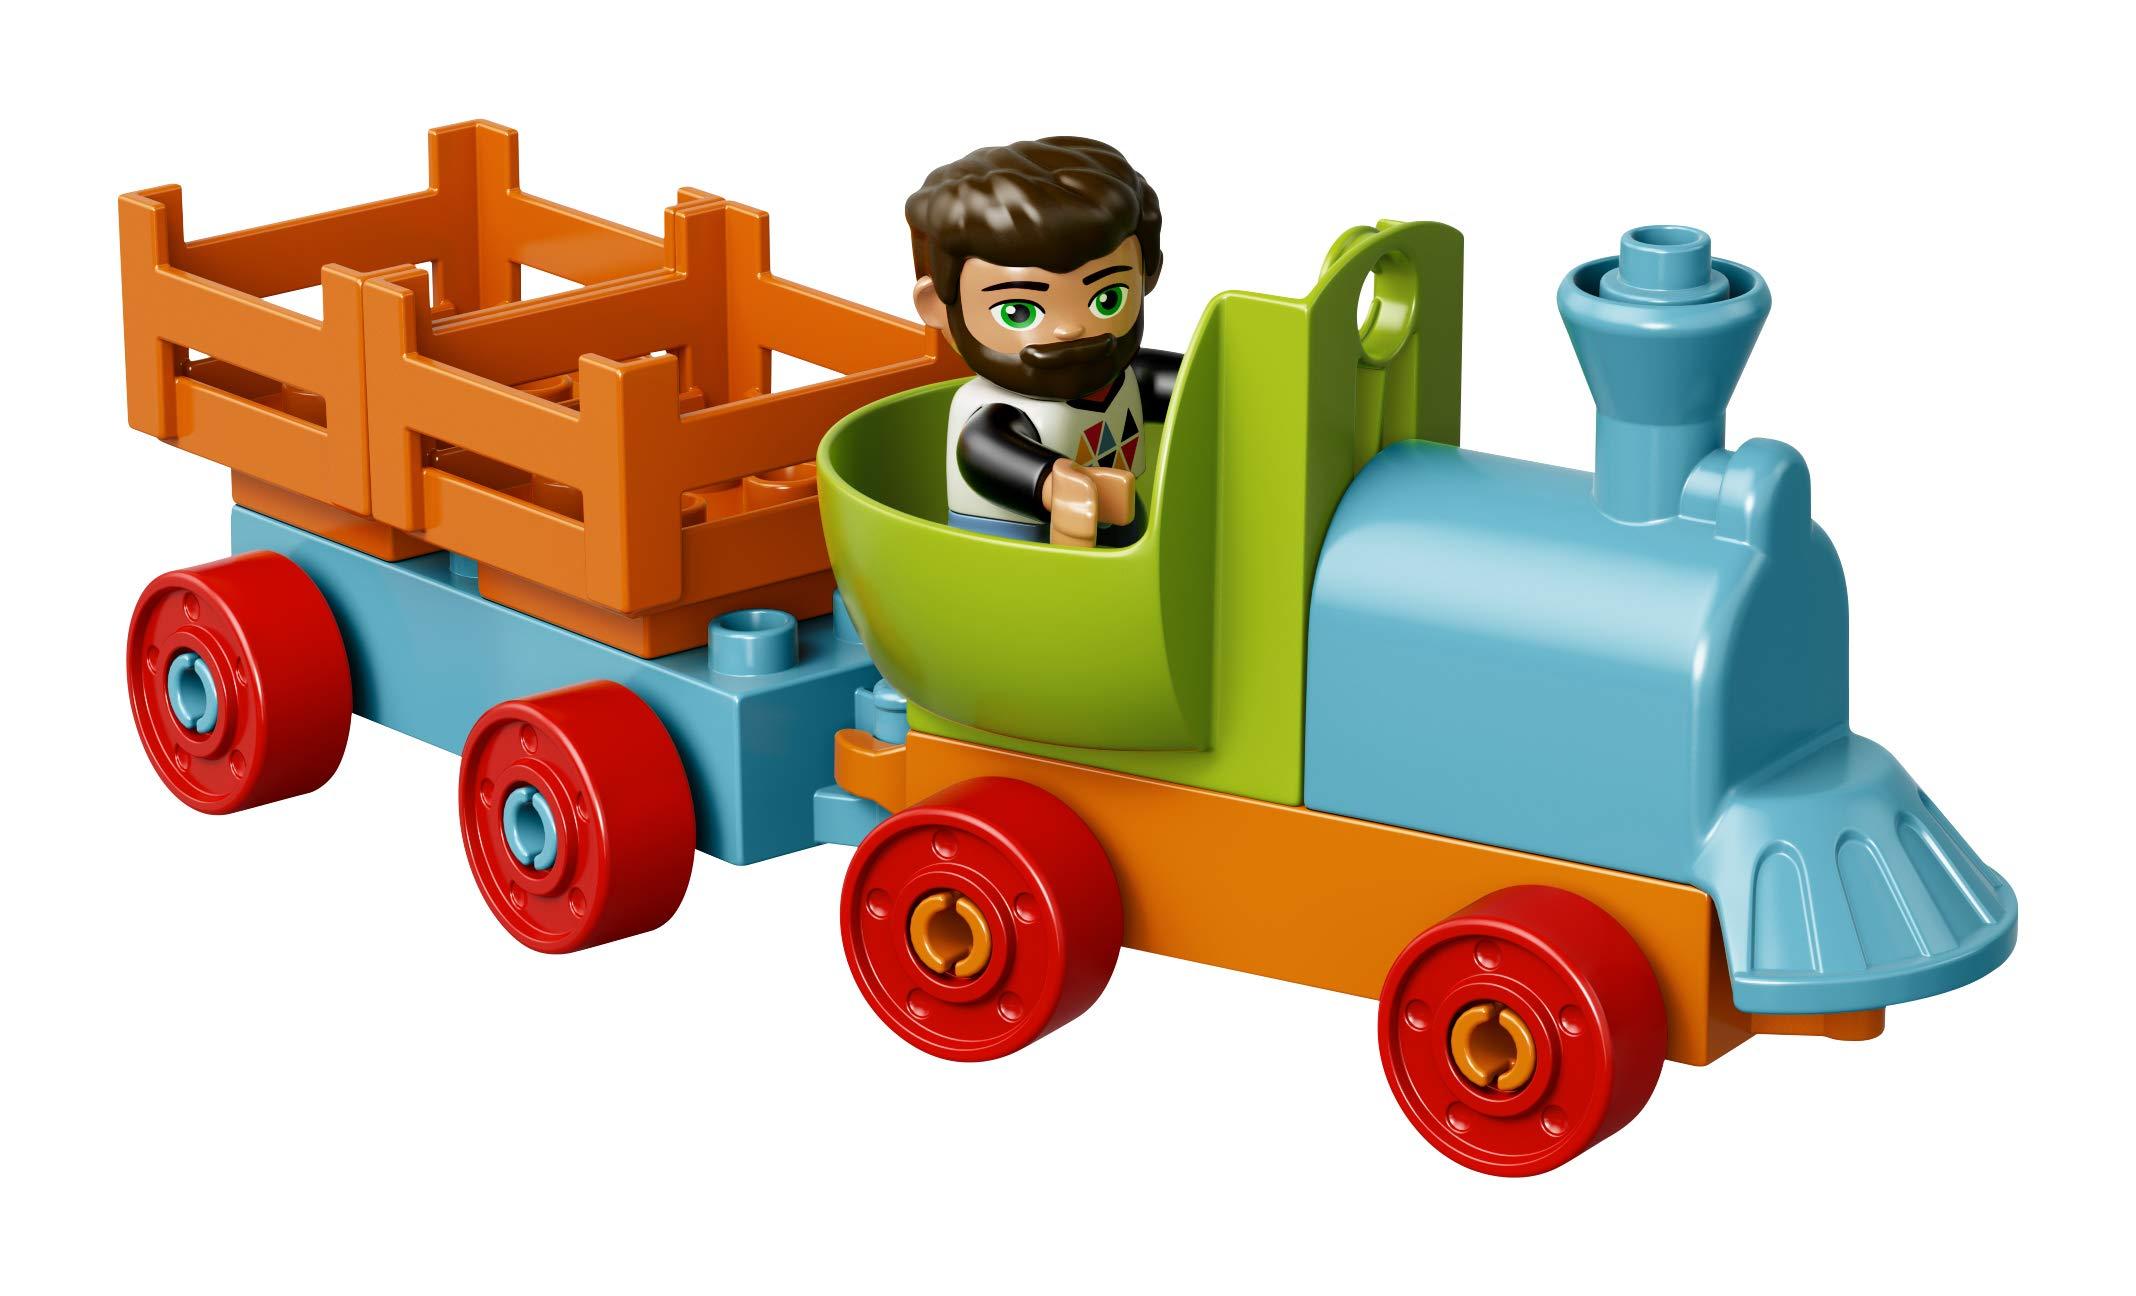 LEGO Duplo - Town il Grande Luna Park, 10840 5 spesavip